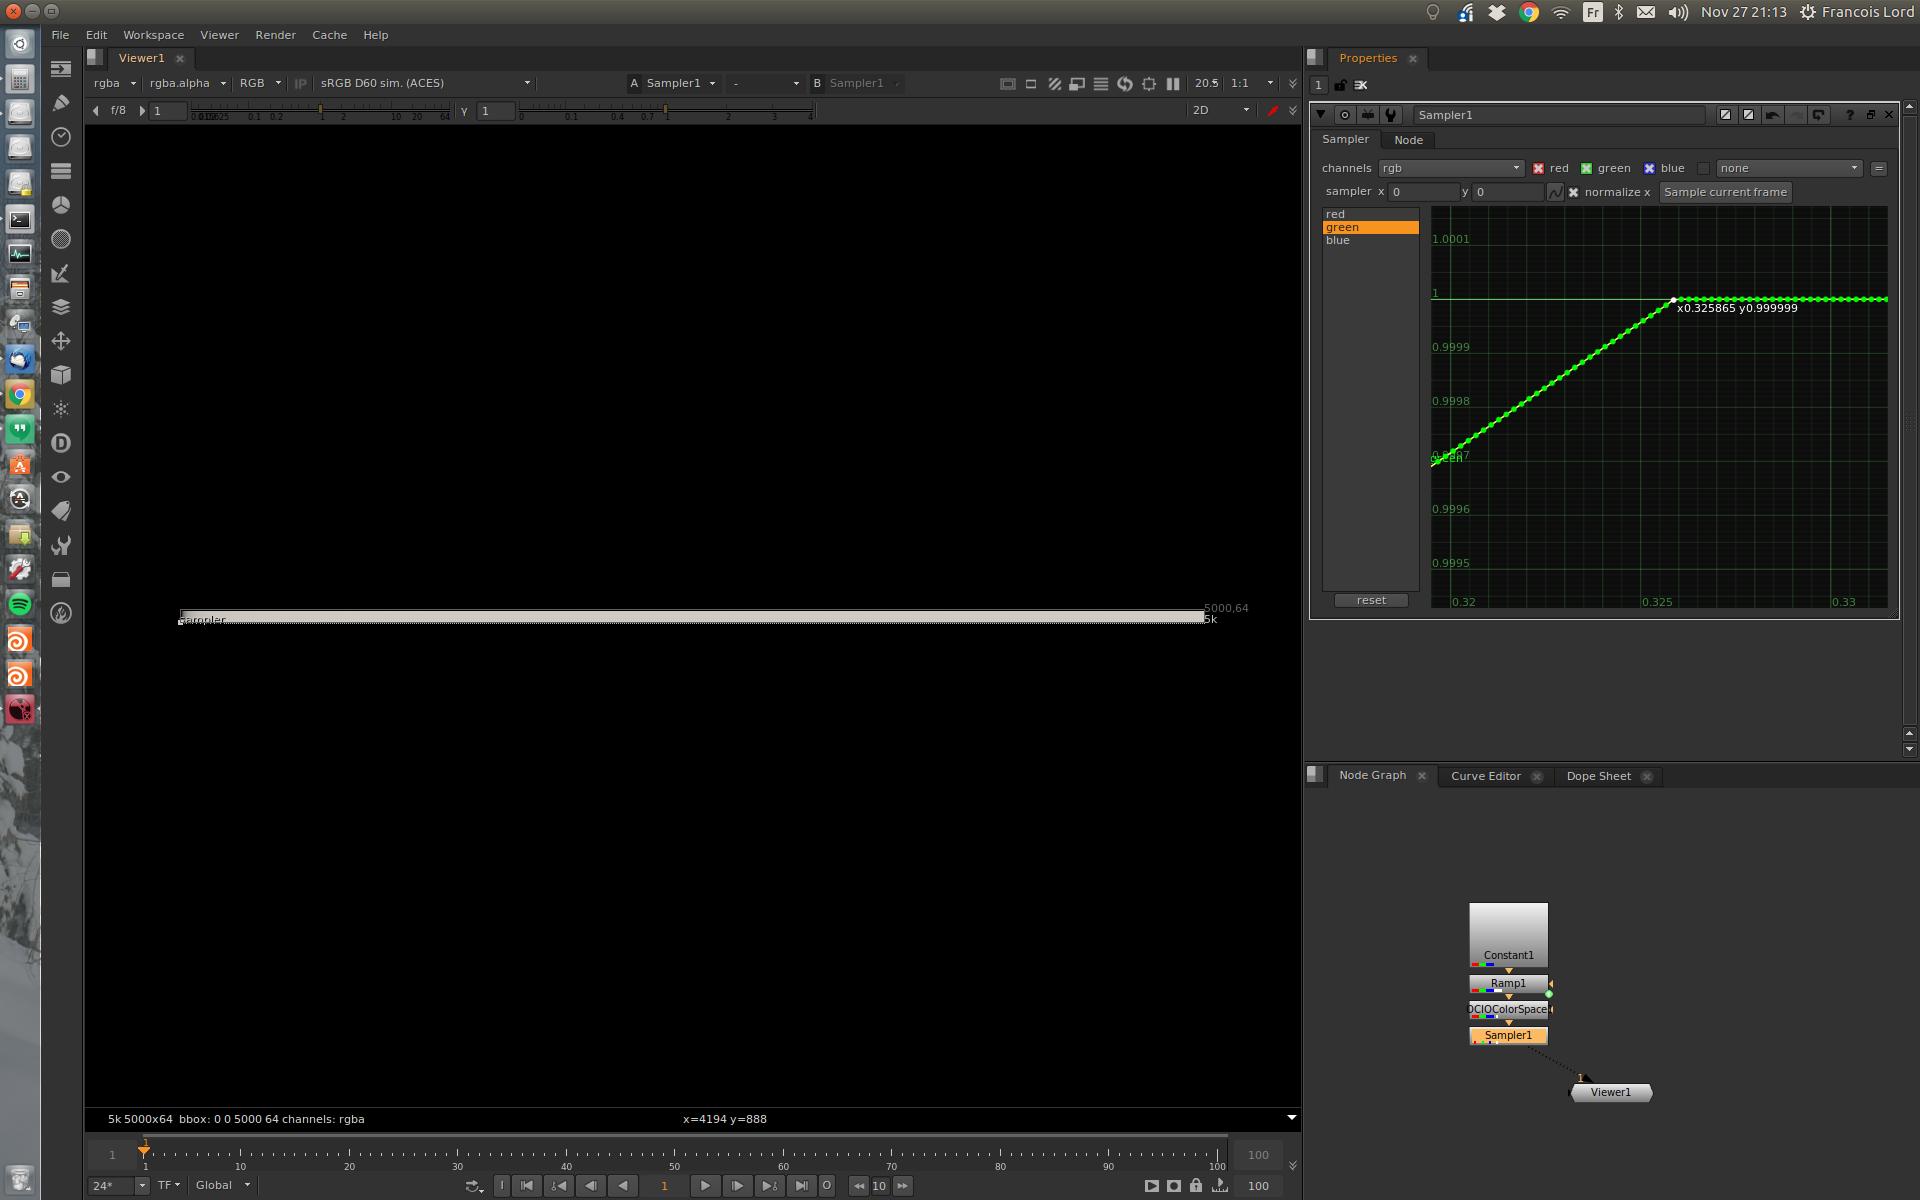 LUT shaper for CG - VFX - ACES Central